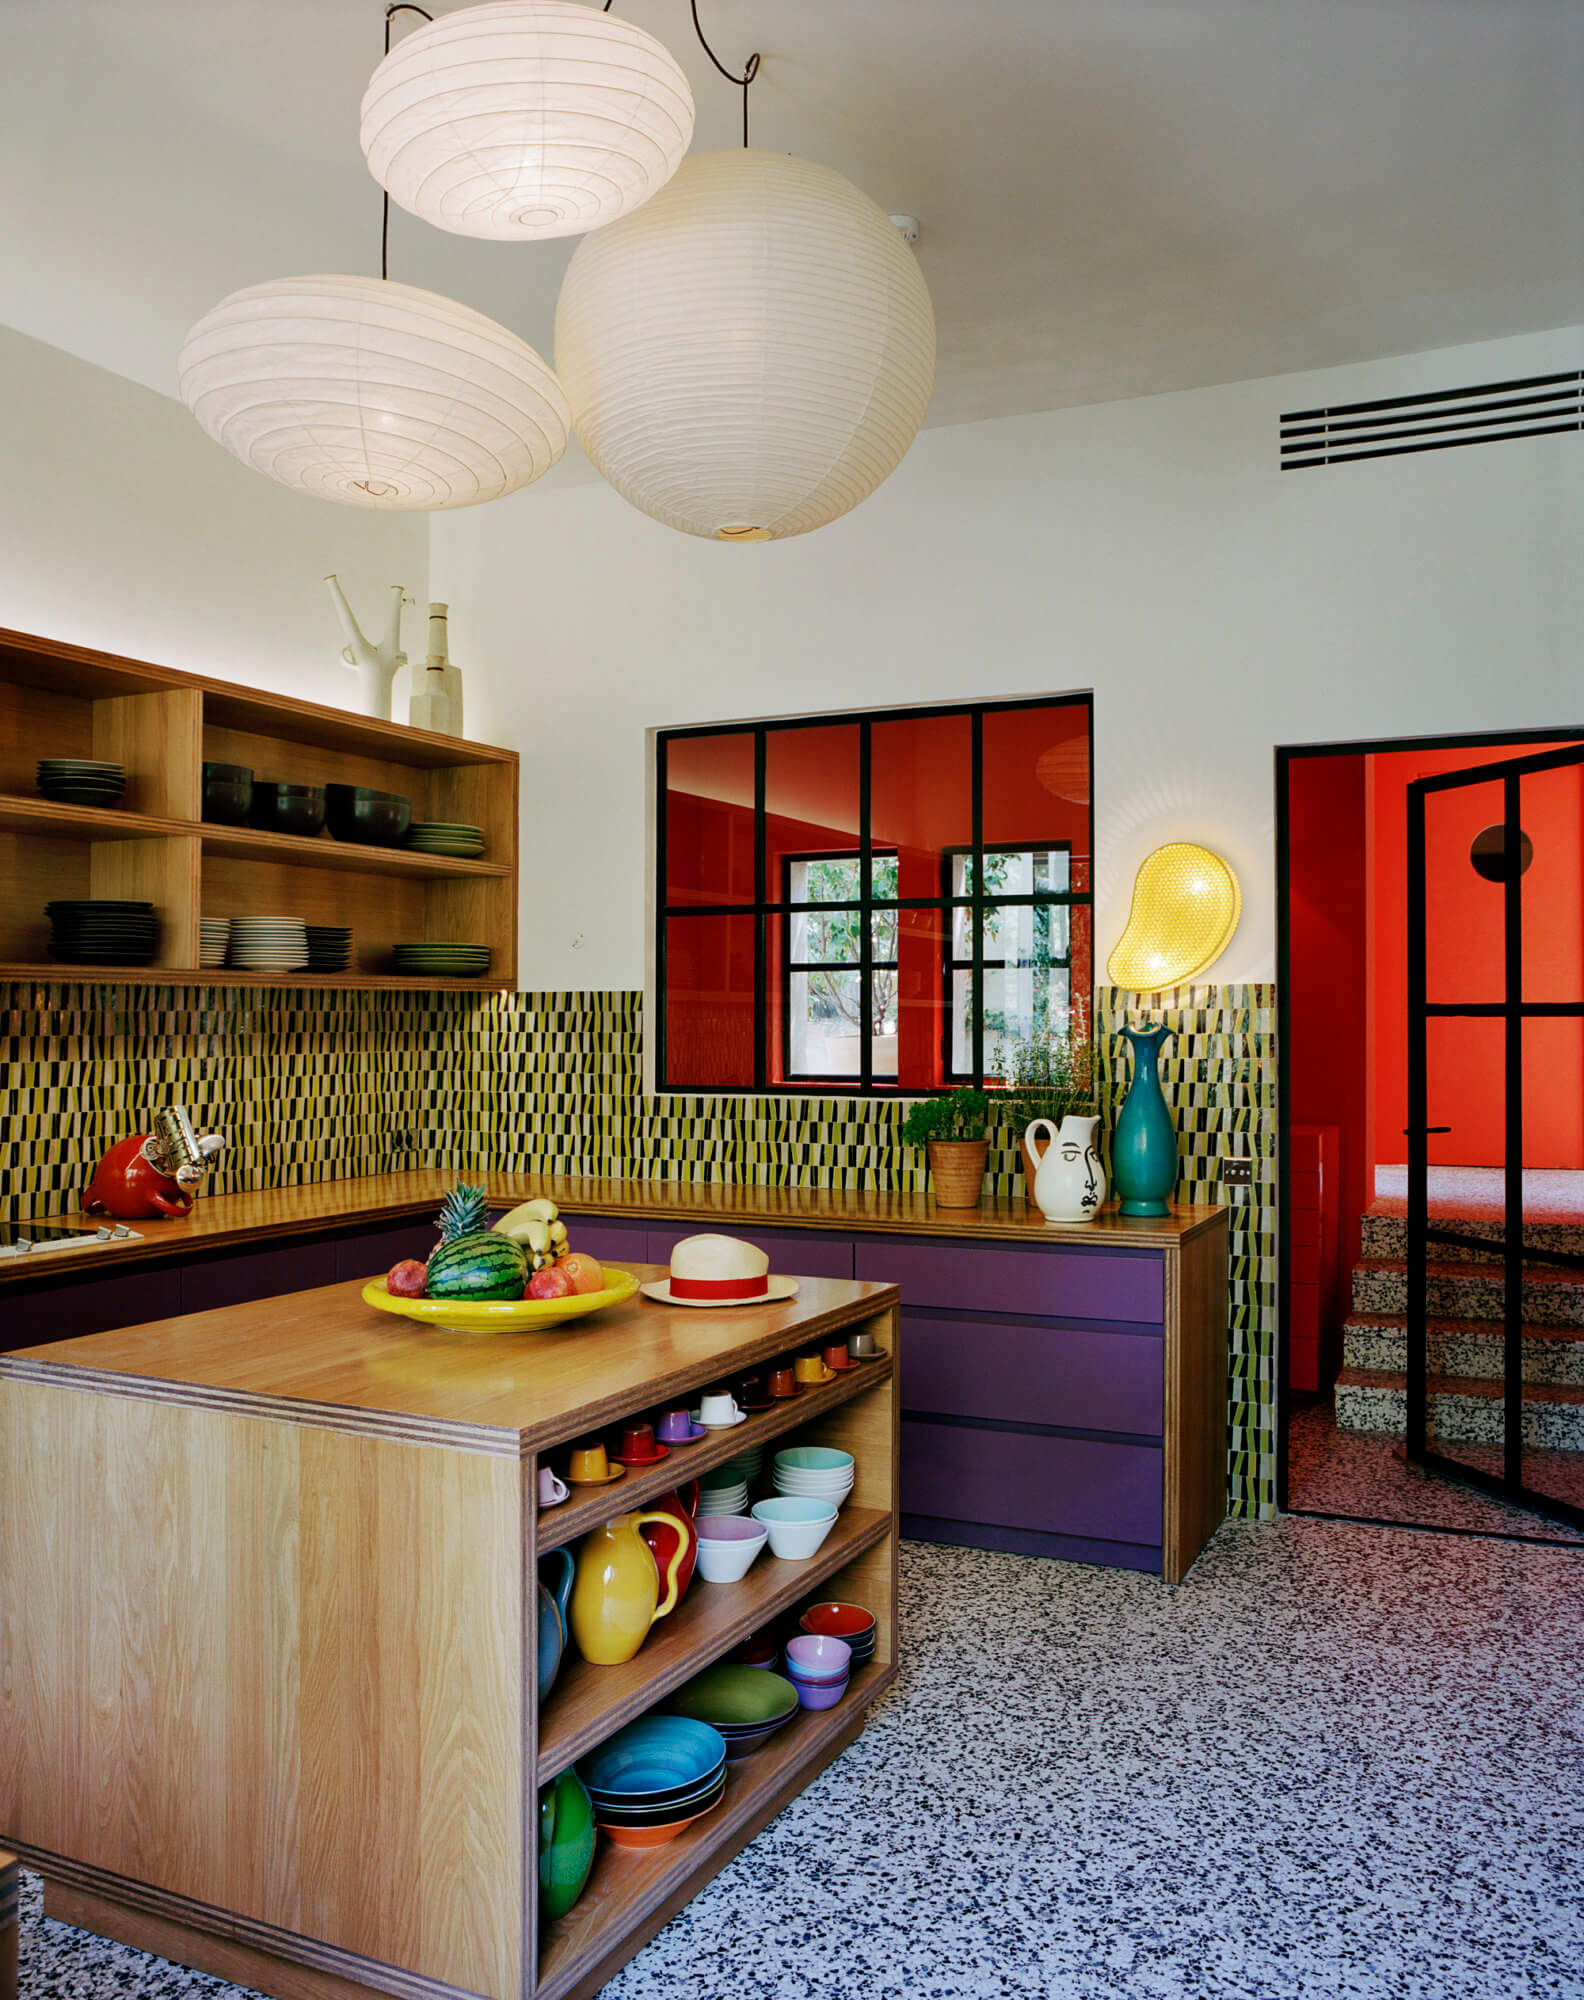 india_mahdavi_Villa-des-Alyscamps_2009_residential_Arles_architecture_design_interior_4-1584x2000.jpg